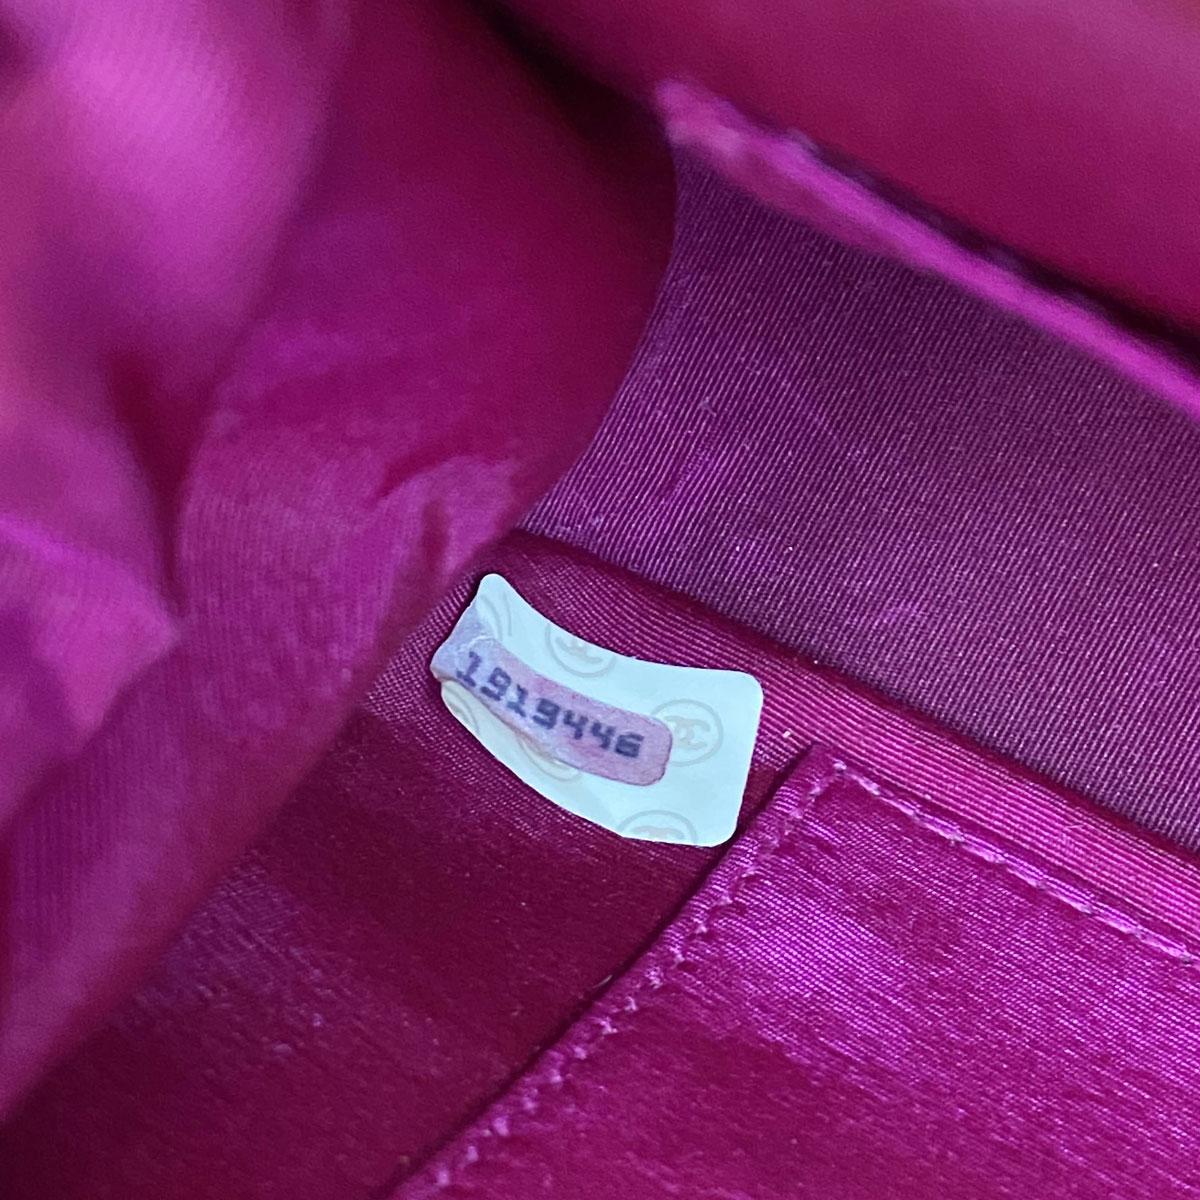 CHANEL シャネル サテン がま口 チェーンショルダーバッグ ピンク 1番台(1990年頃製造)